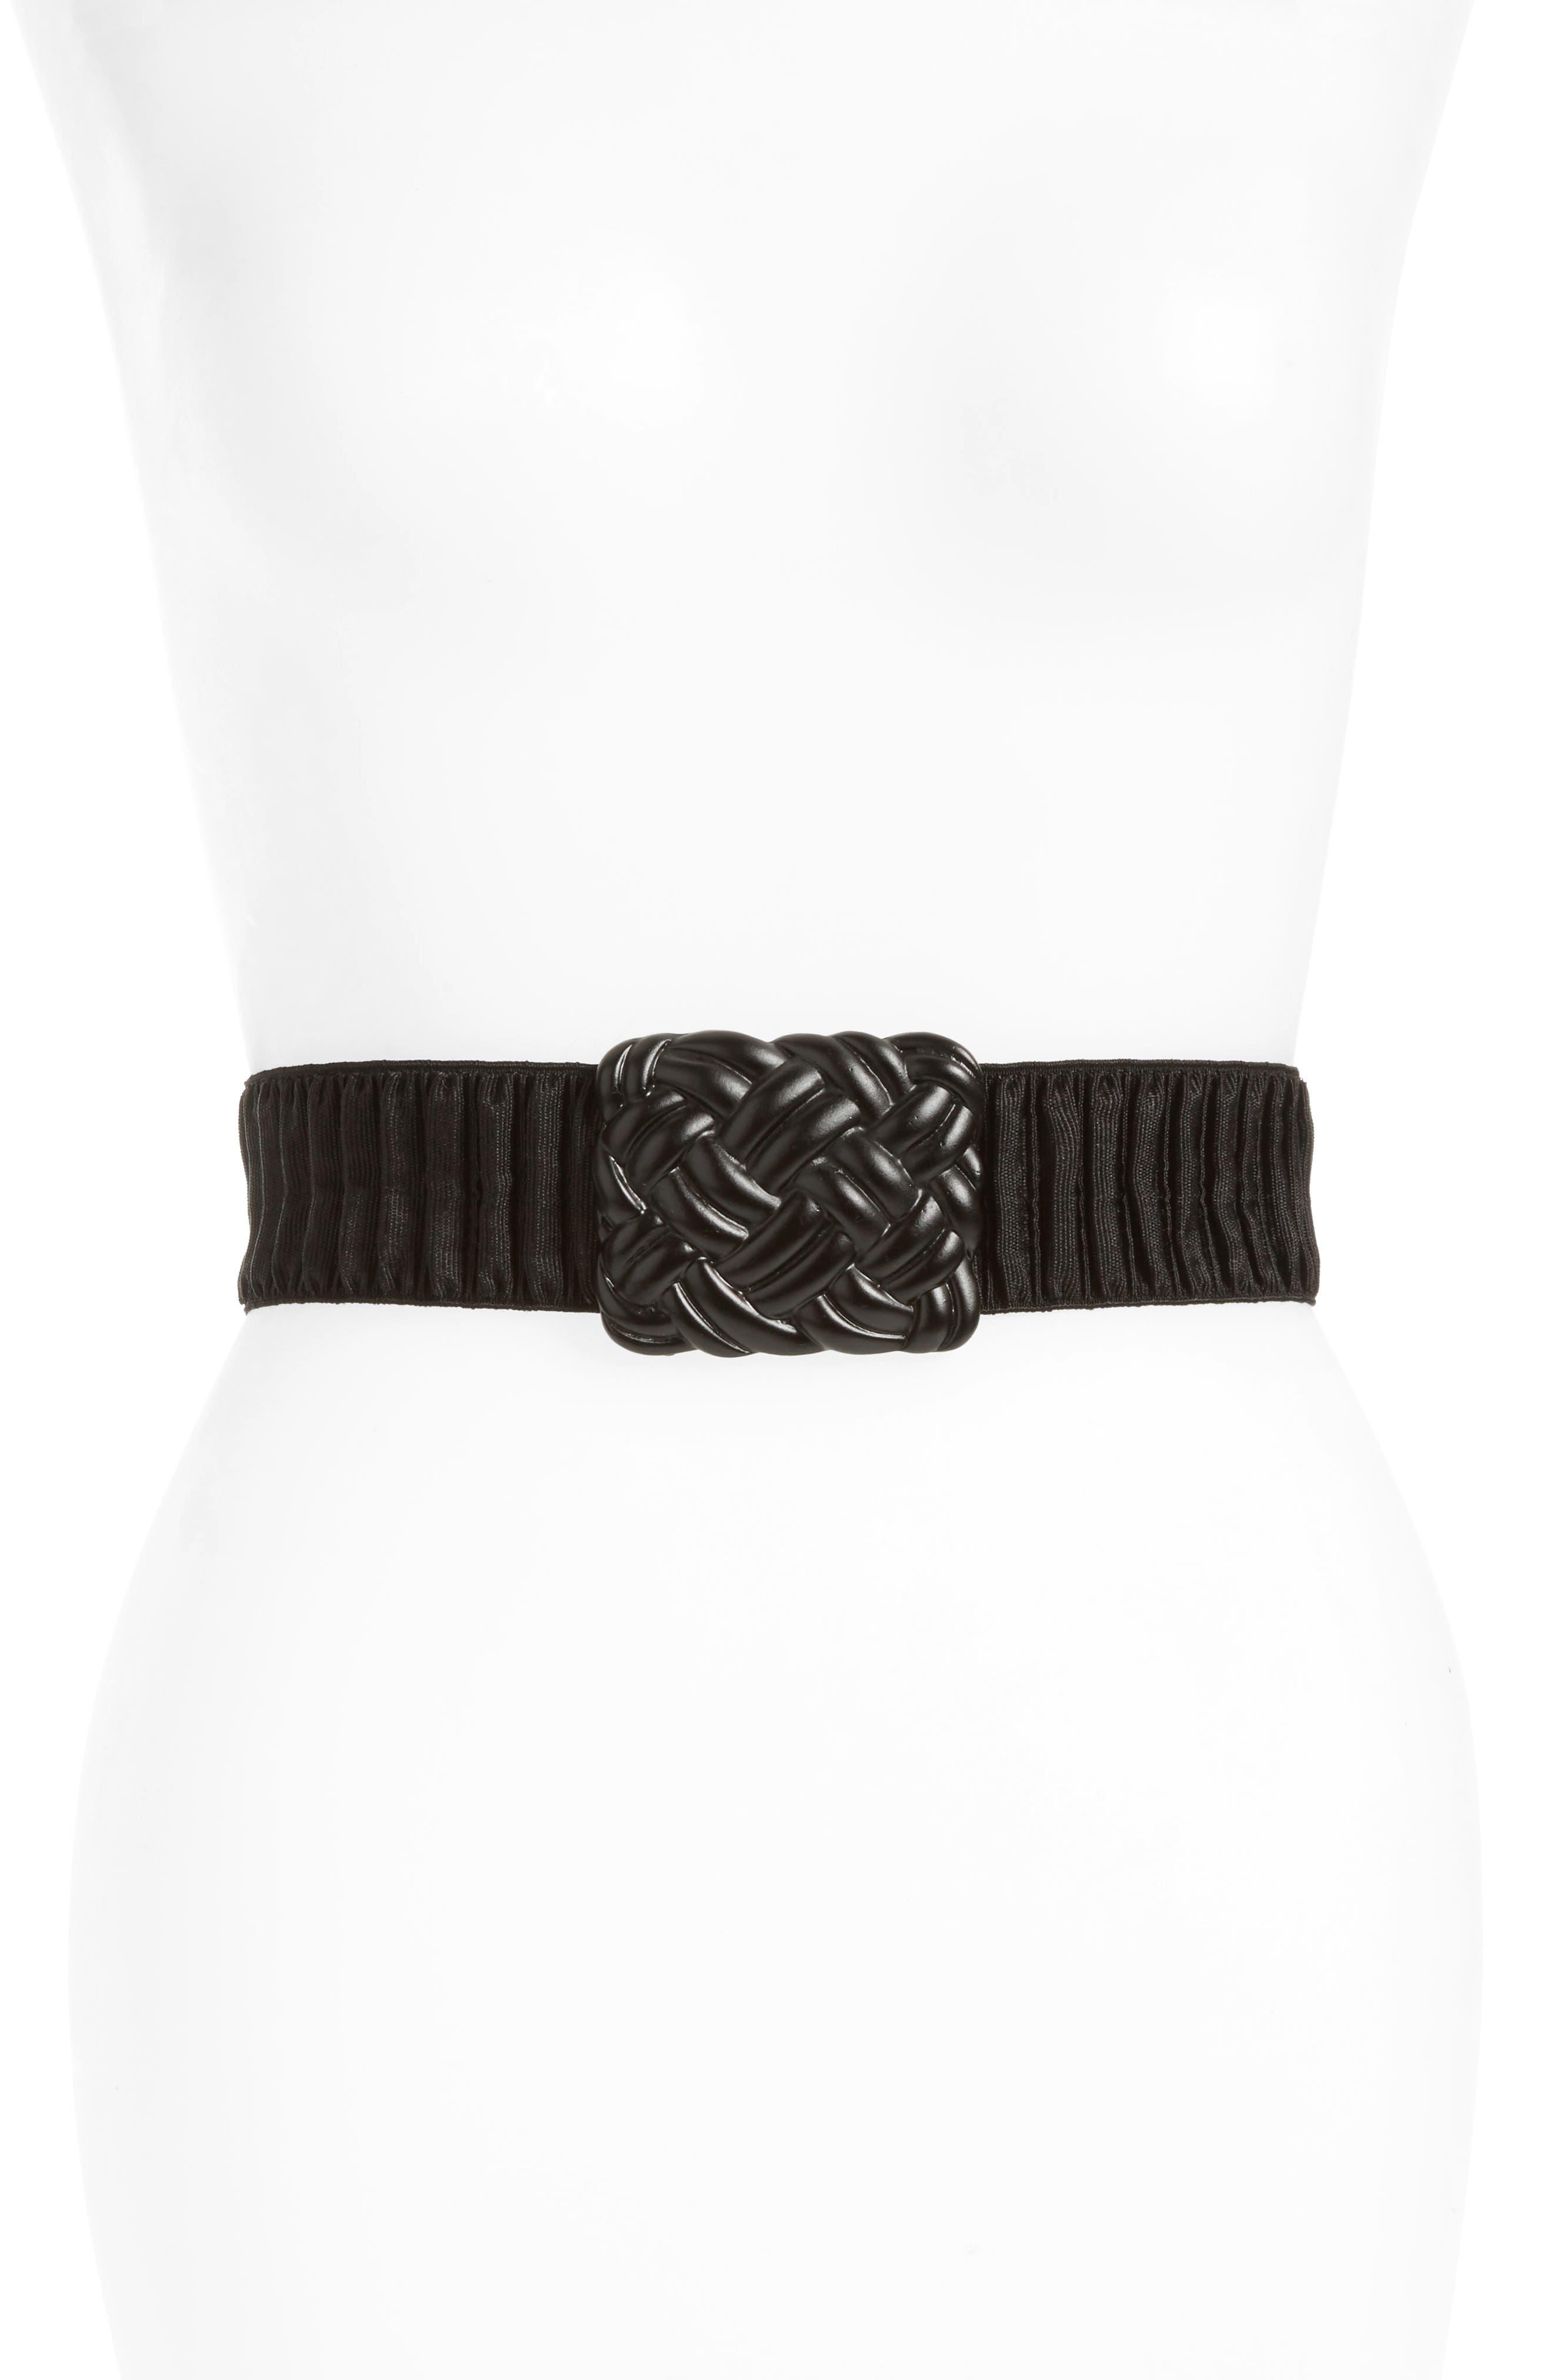 Natasha Couture Woven Stretch Belt